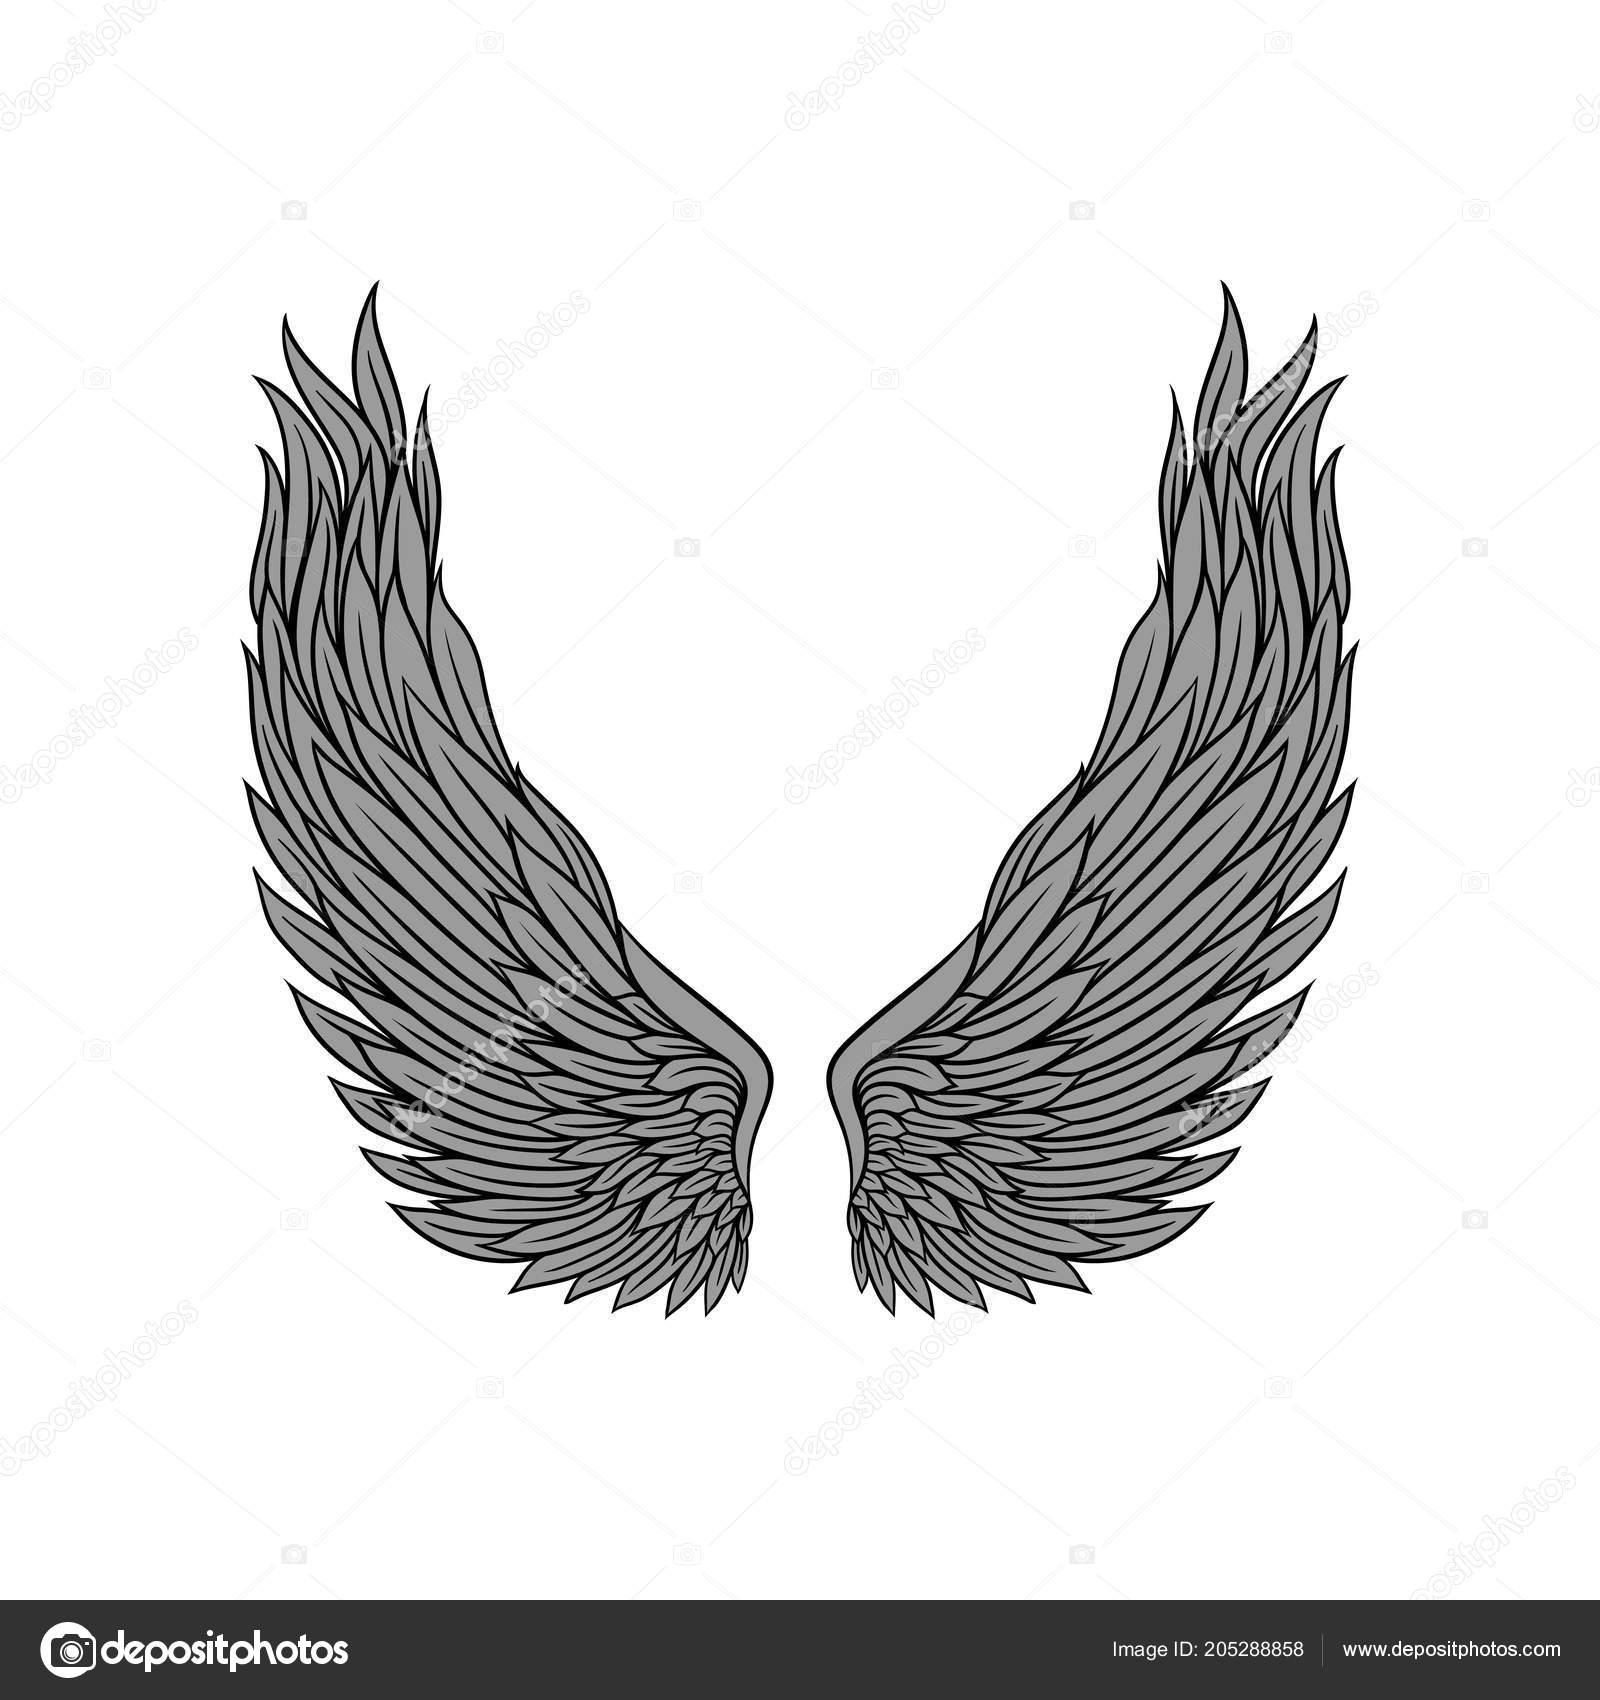 Skrzydła Anioła Duże Szare Pióra I Czarny Kontur Stary